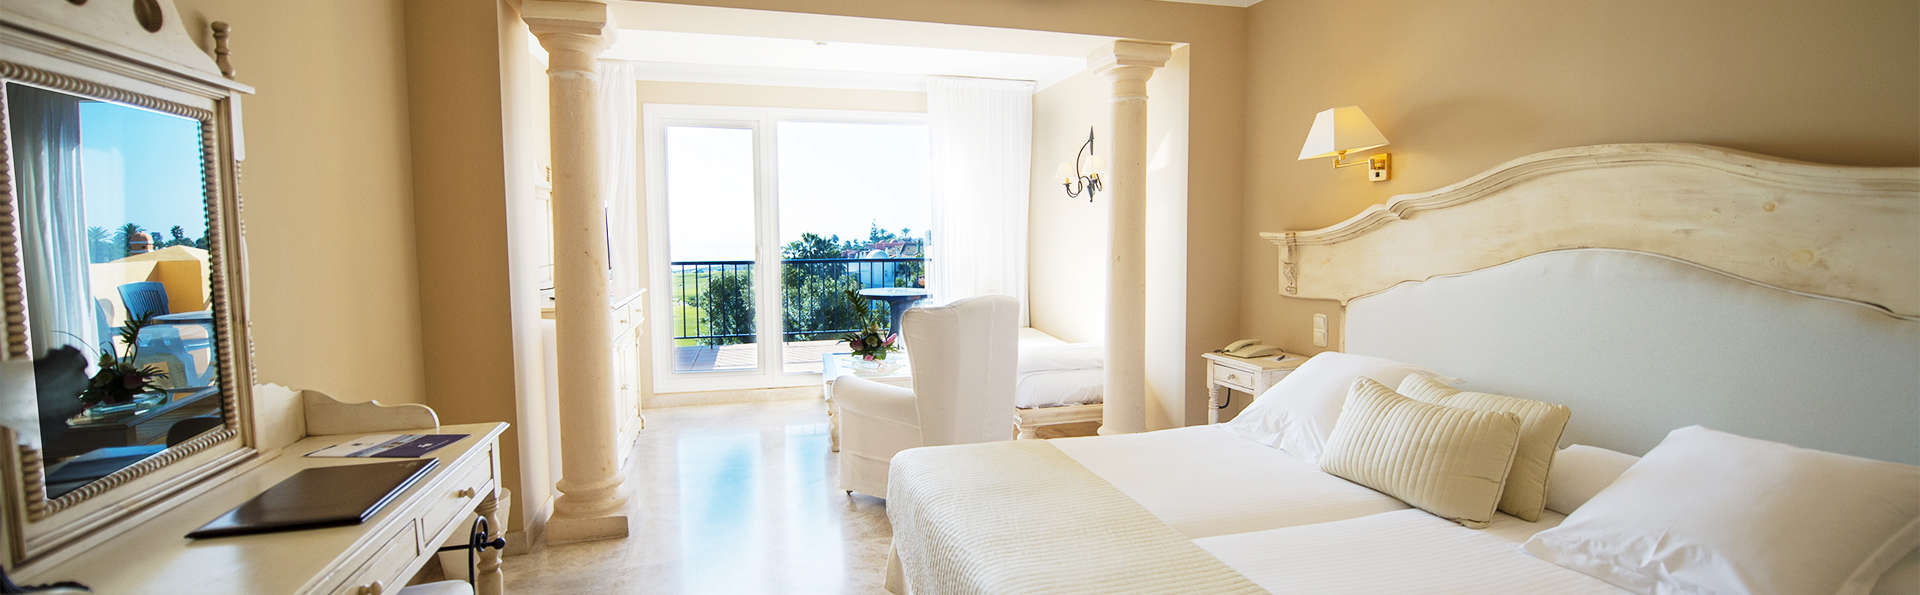 Escapade de luxe avec dîner et spa à Marbella